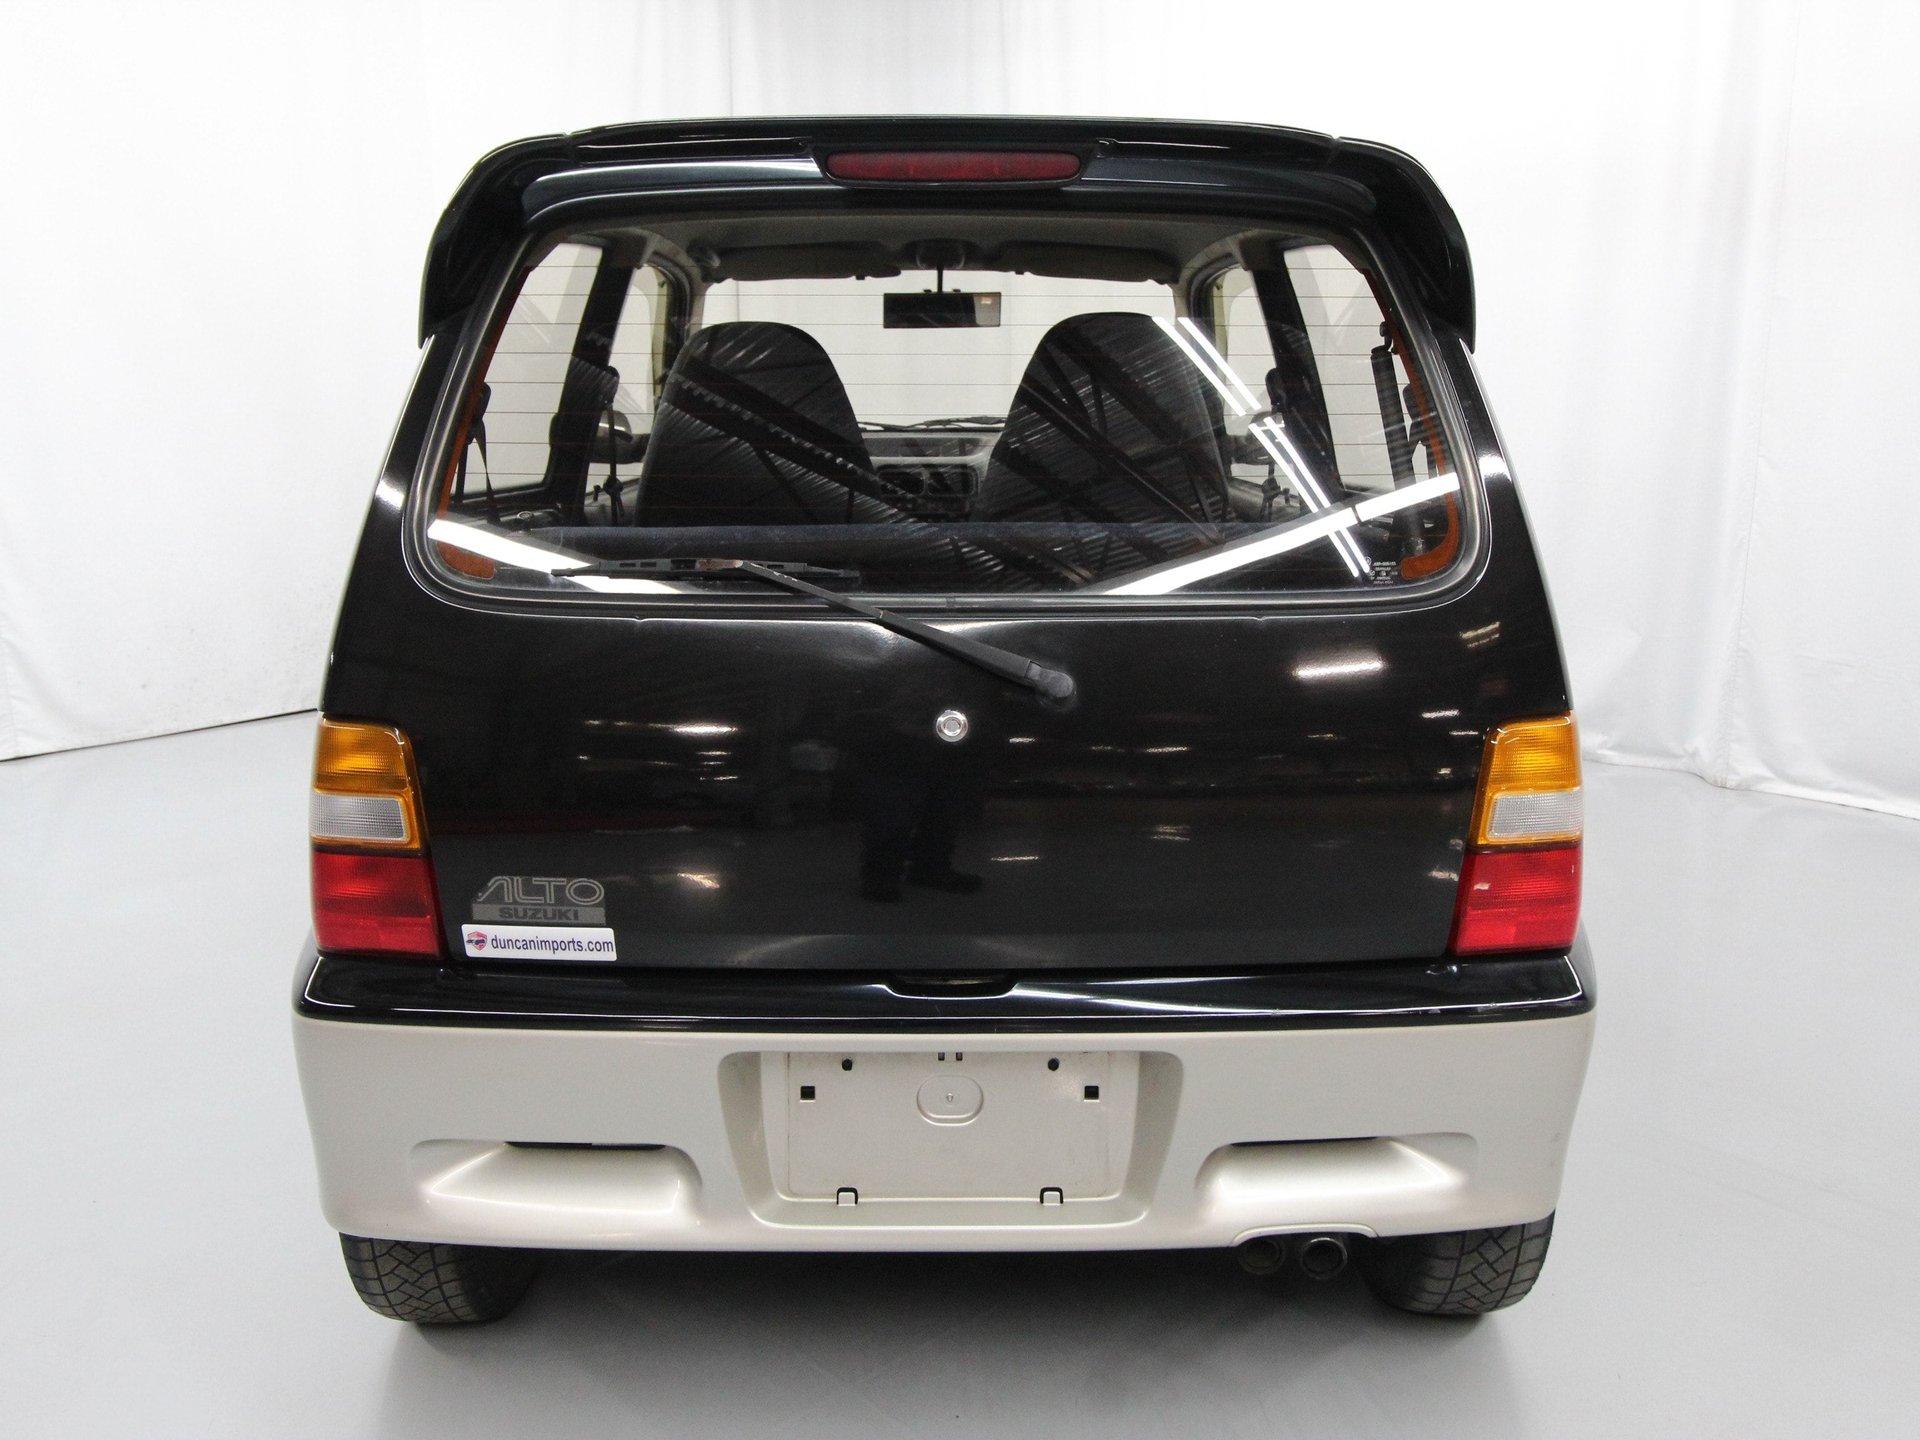 1995 Suzuki Alto